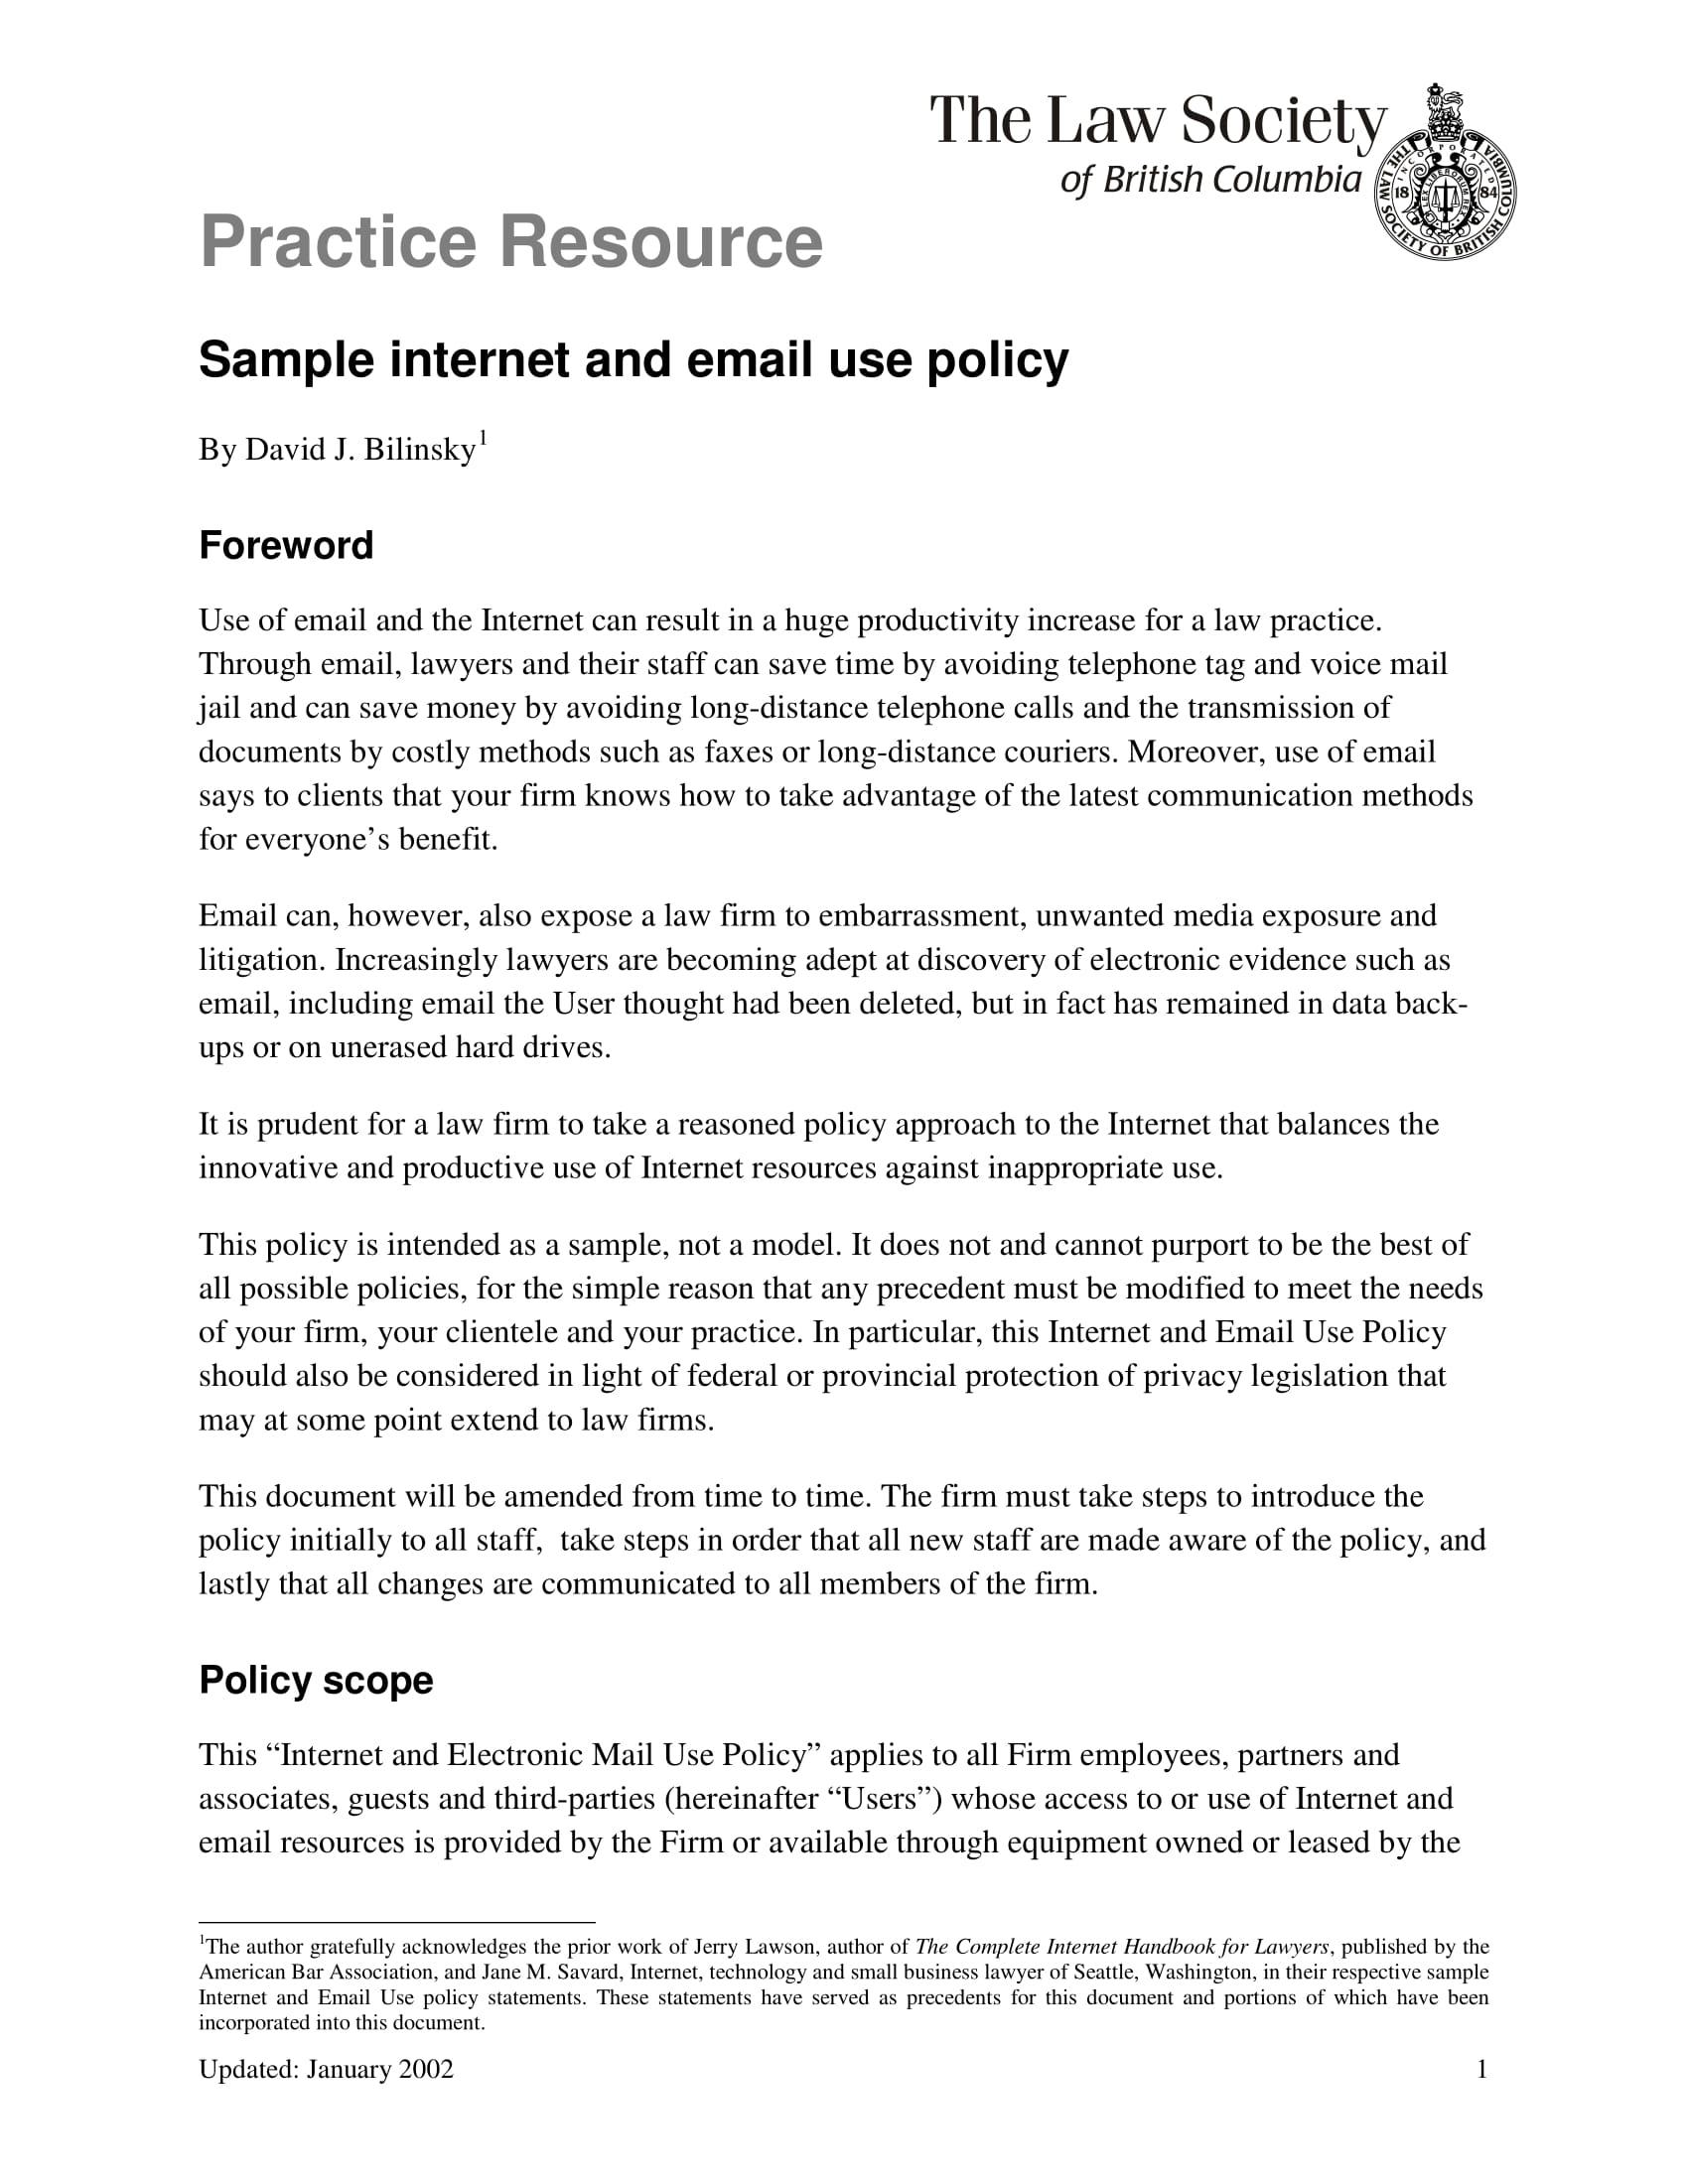 internetpolicy 1